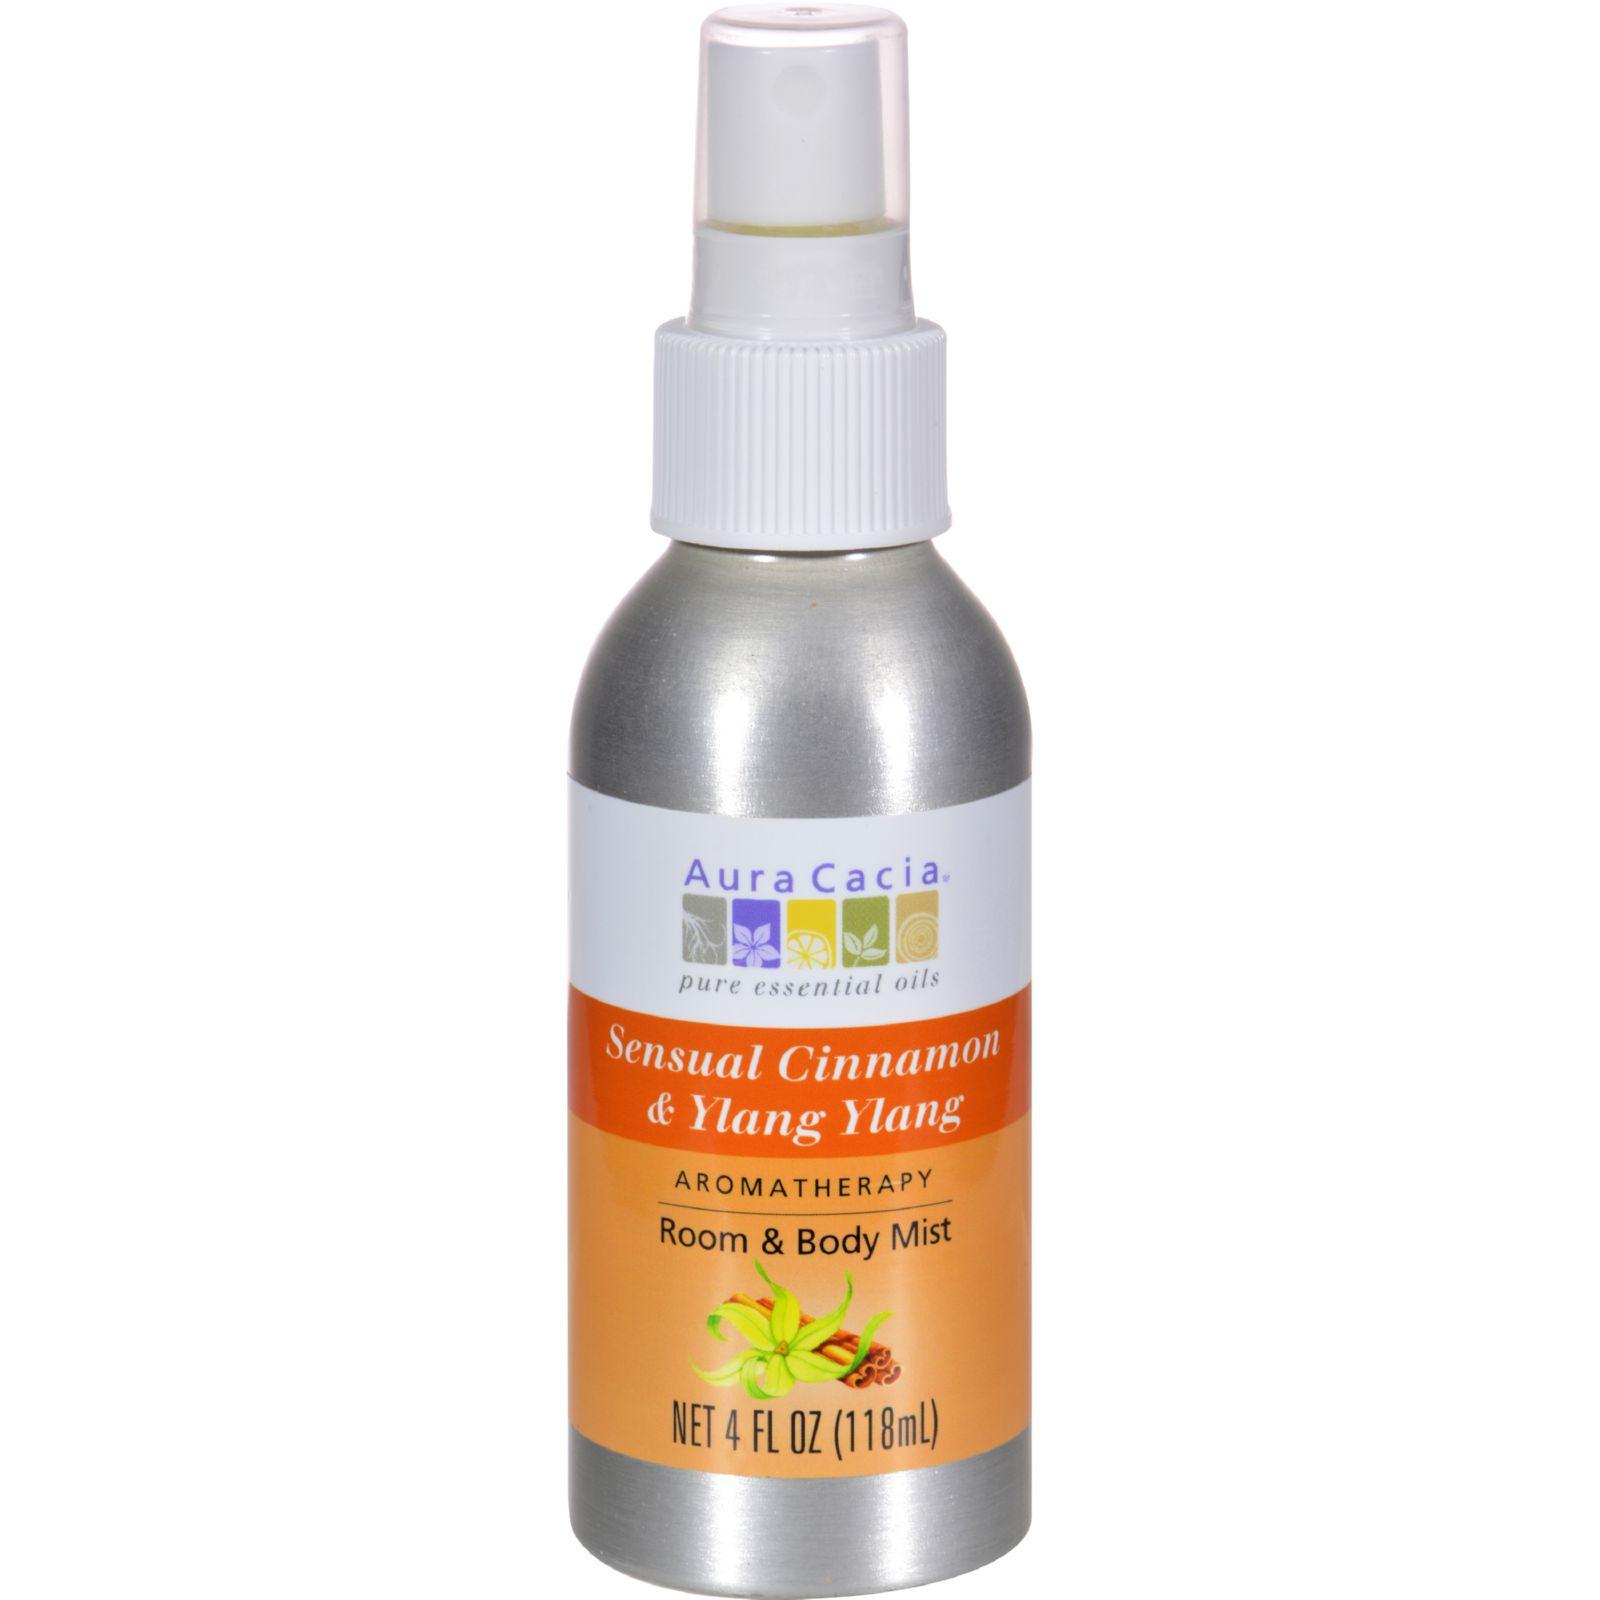 Aura Cacia Aromatherapy Mist Cinnamon Ylang Ylang - 4 fl oz